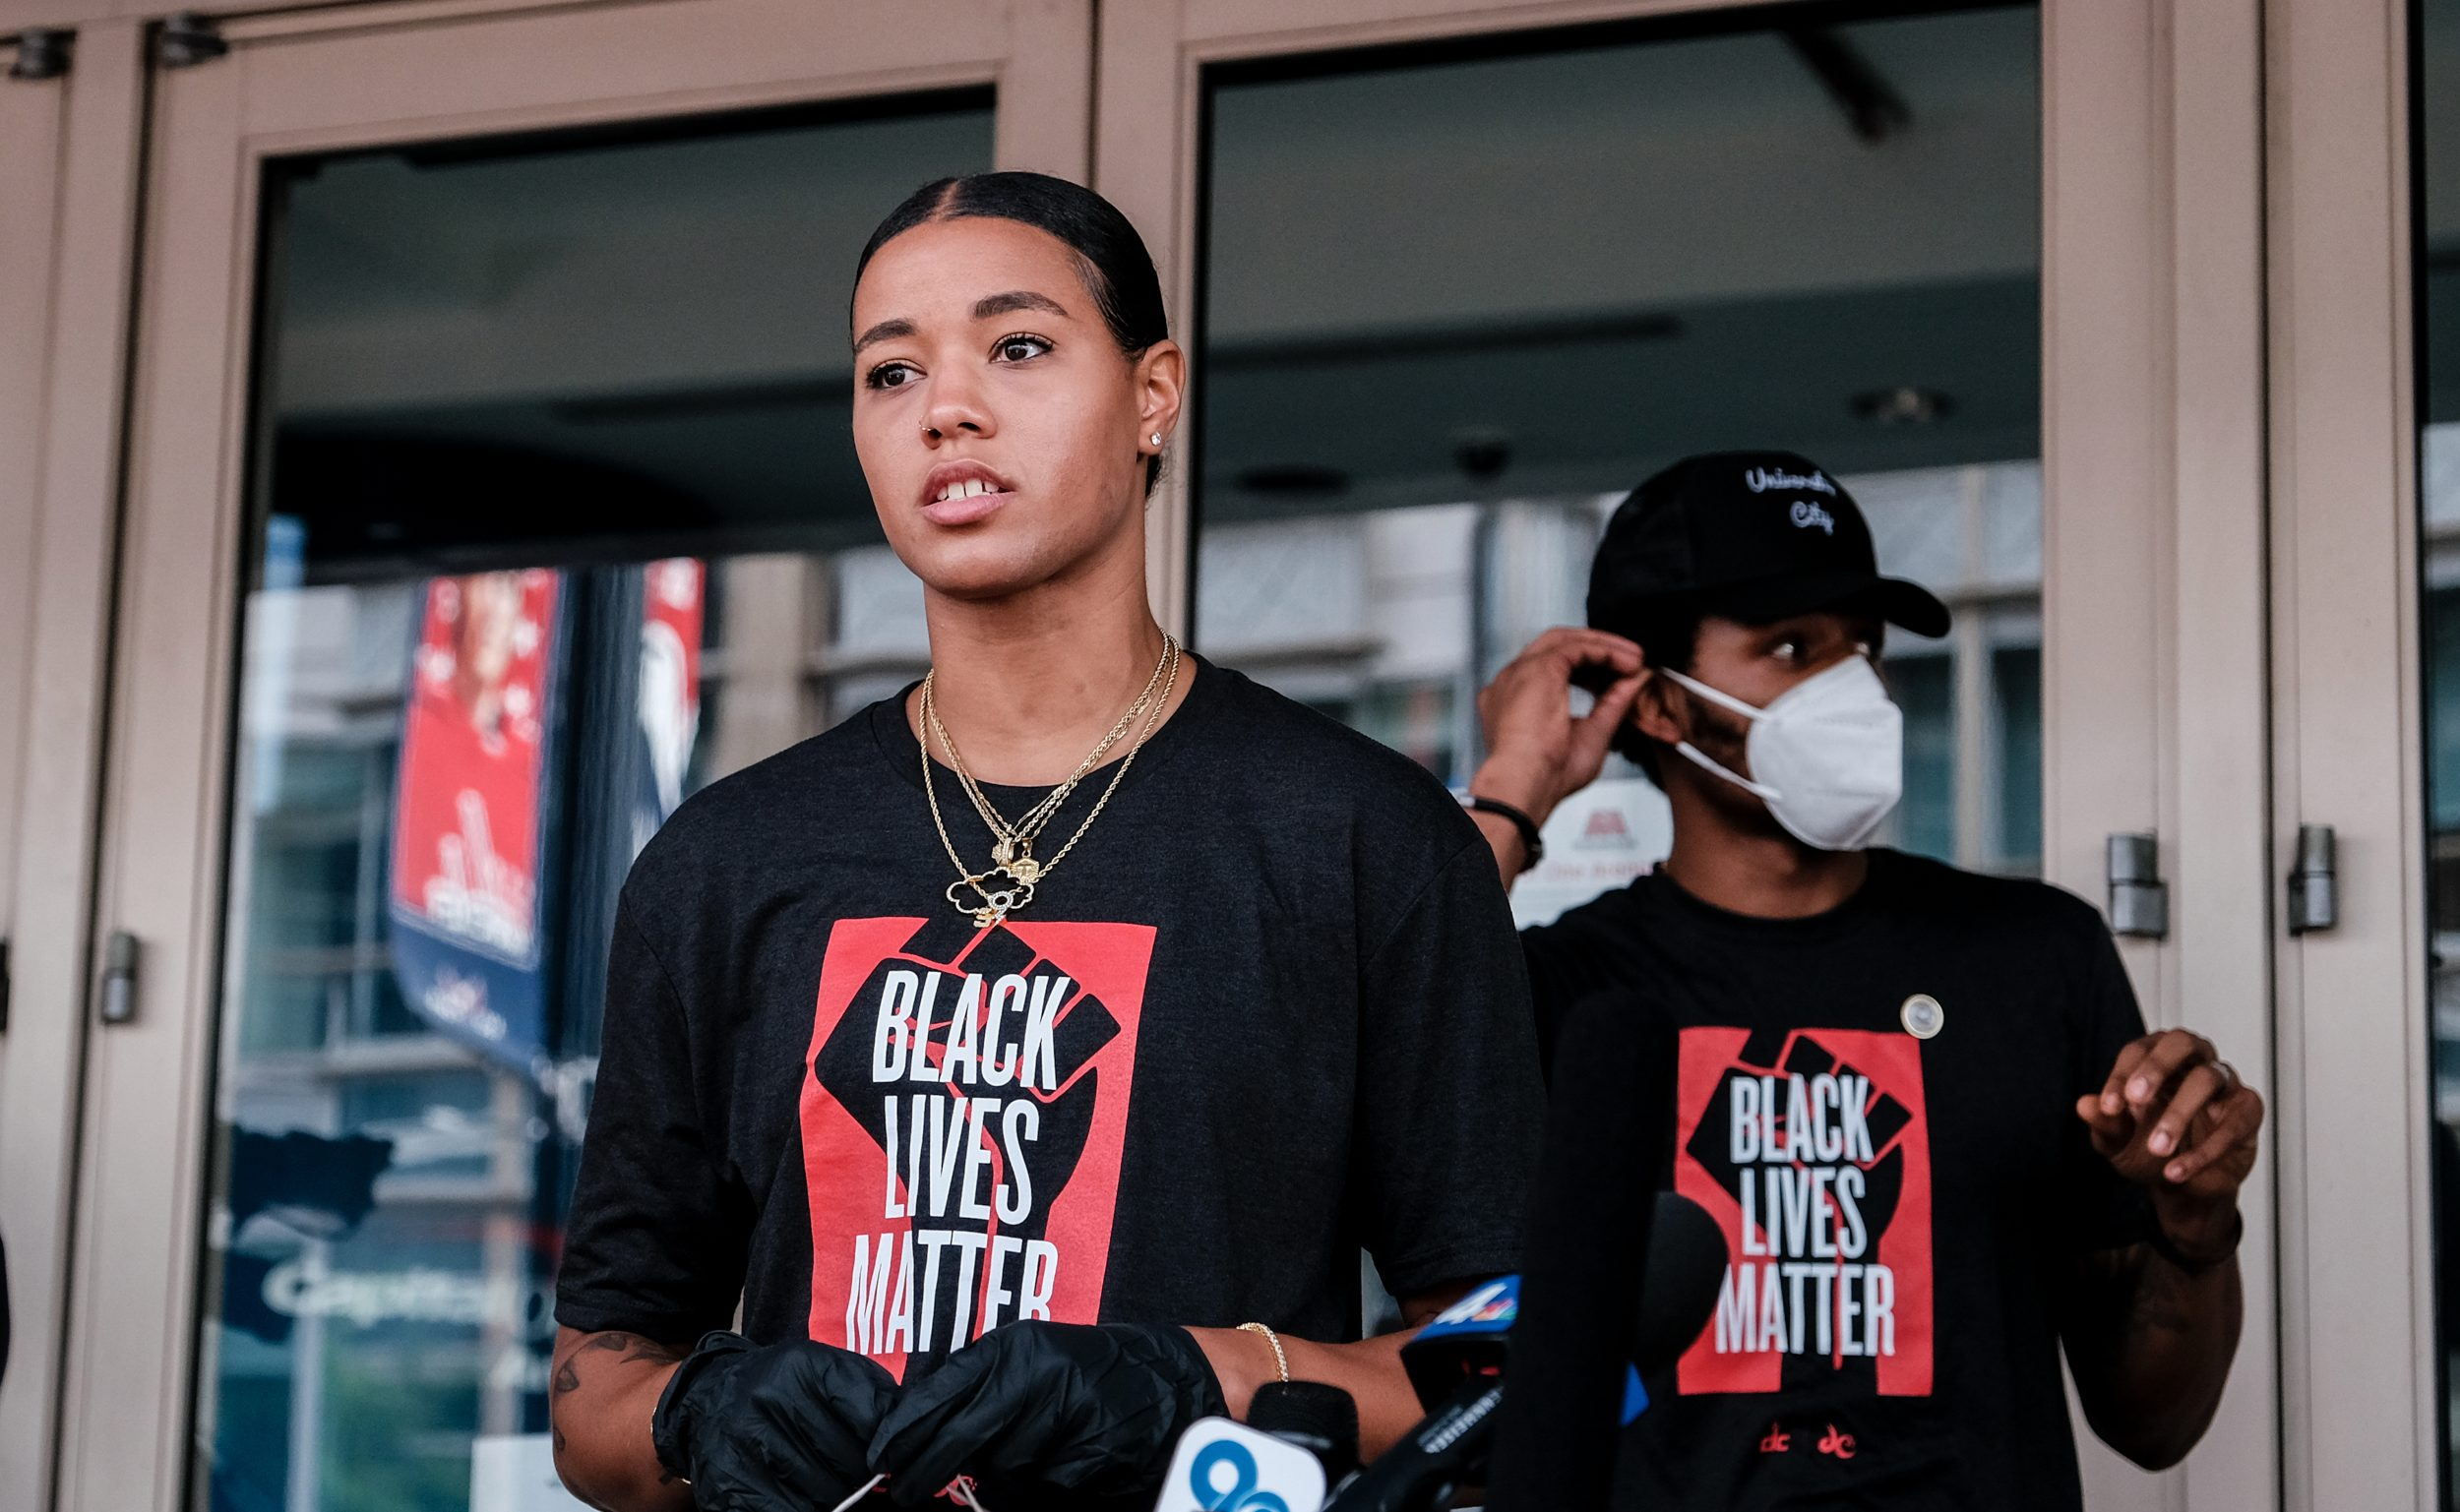 La capital se tiñe de protestas lideradas por deportistas